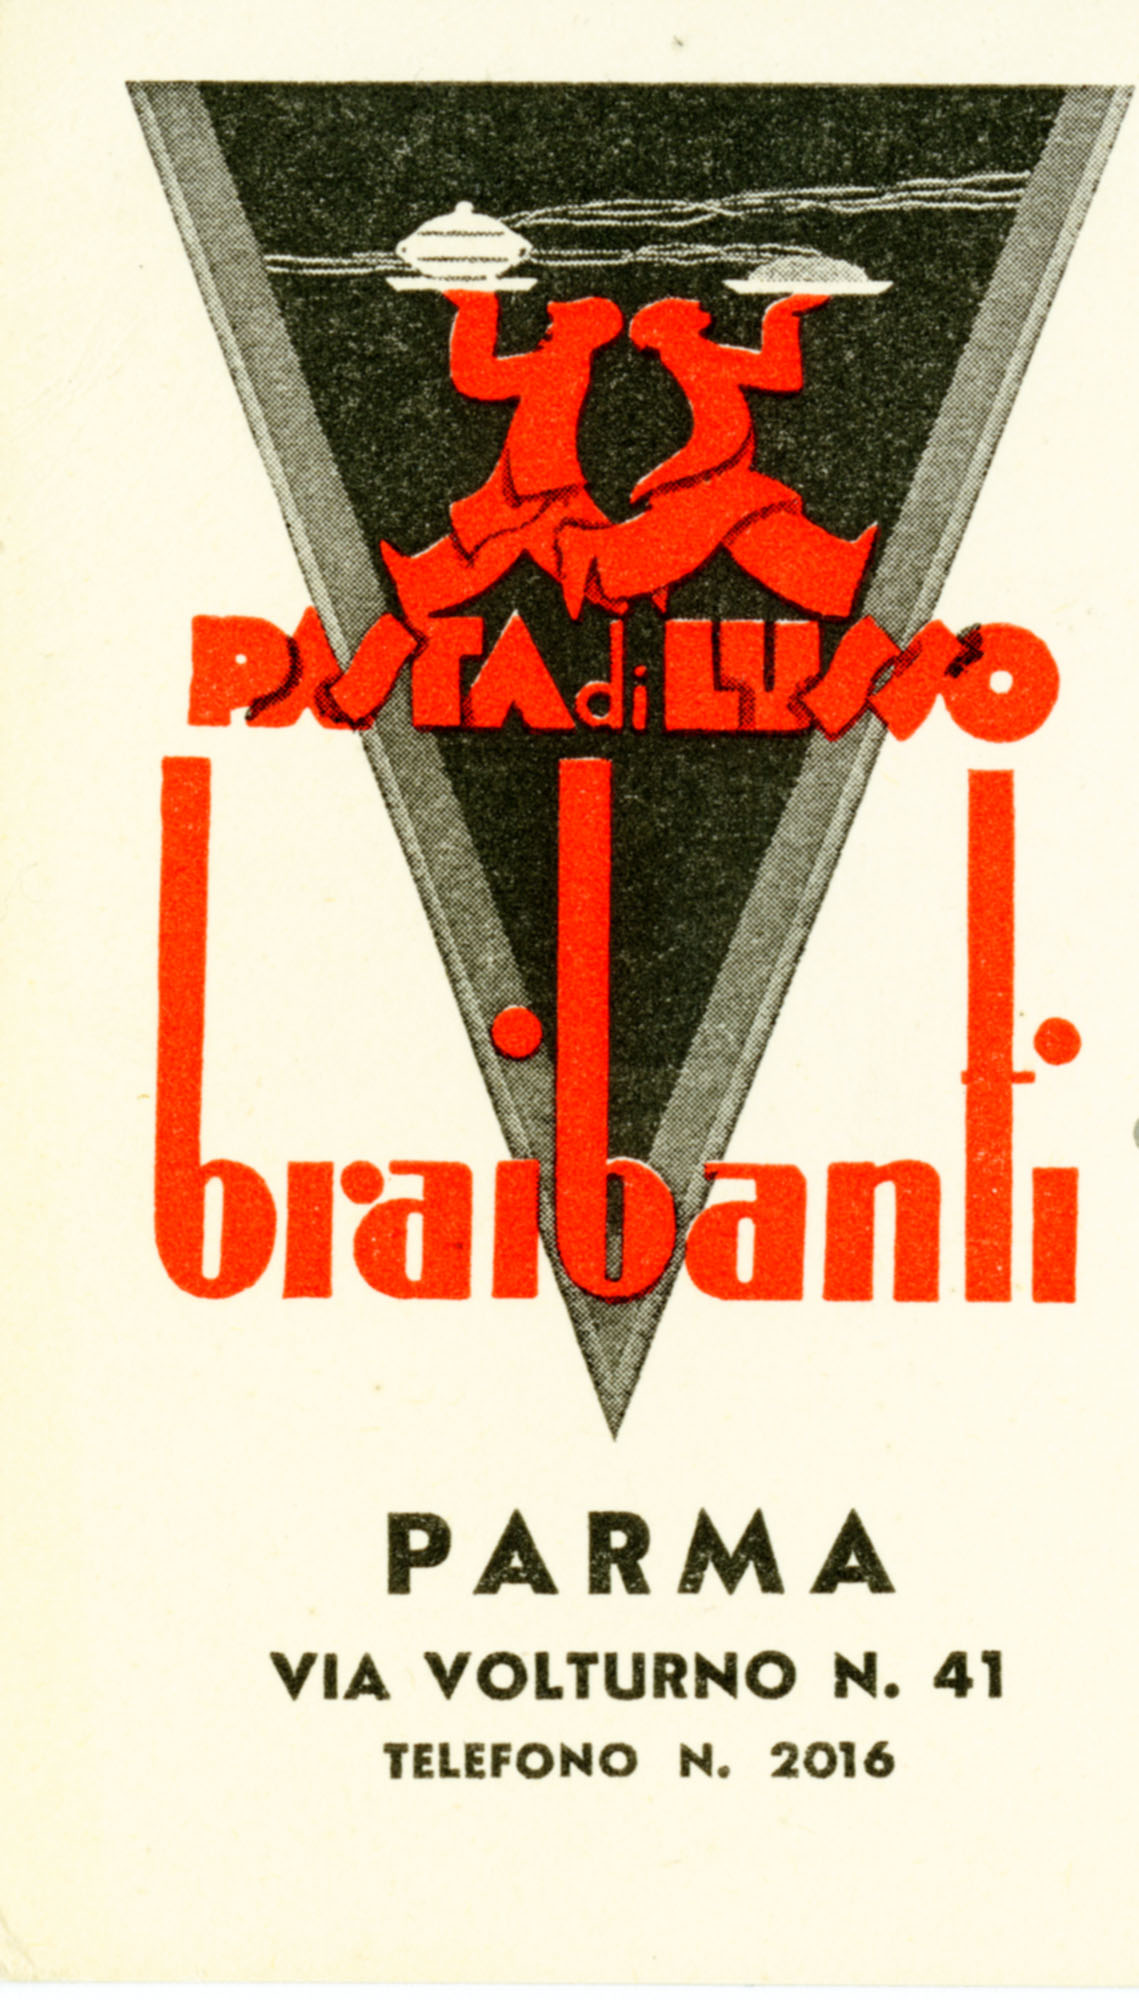 Braibanti Brand, 1938